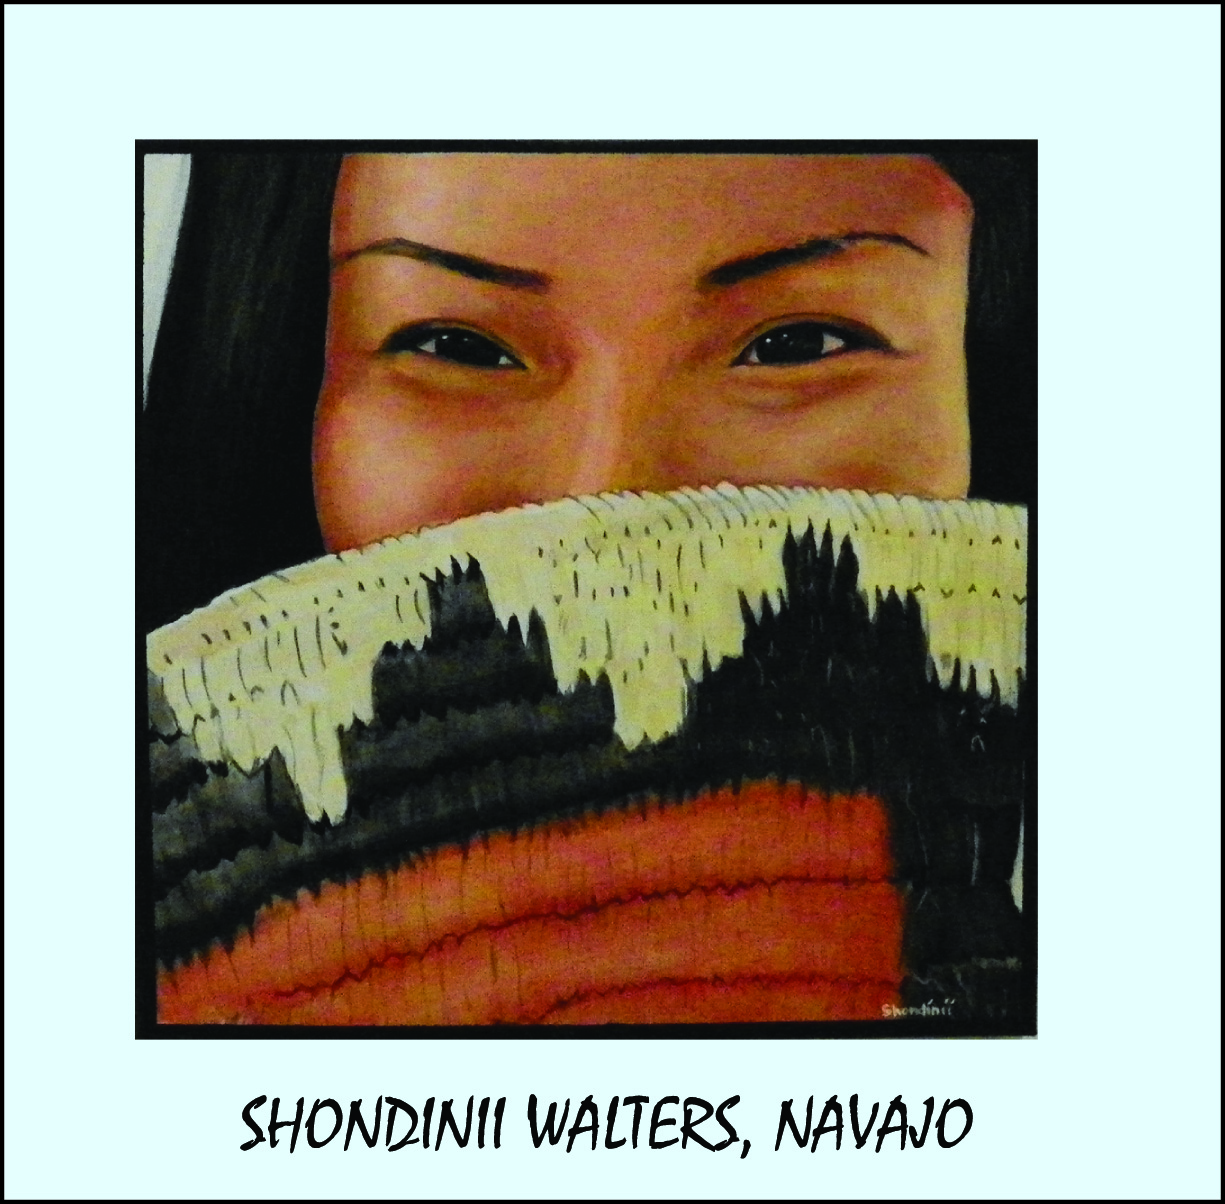 Shondinii Walters, Navajo Artist